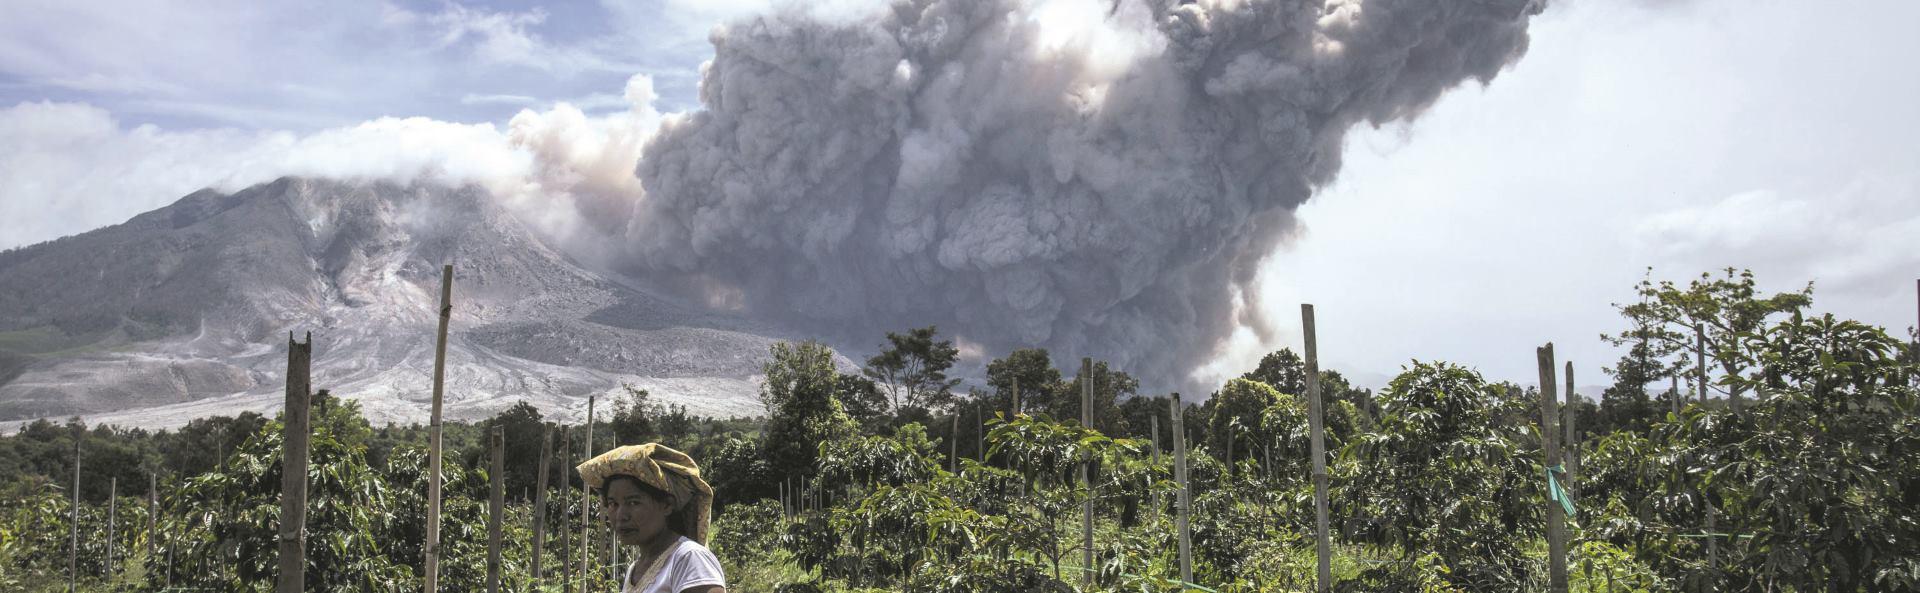 VIDEO: Eruptirao vulkan na planini Sinabung